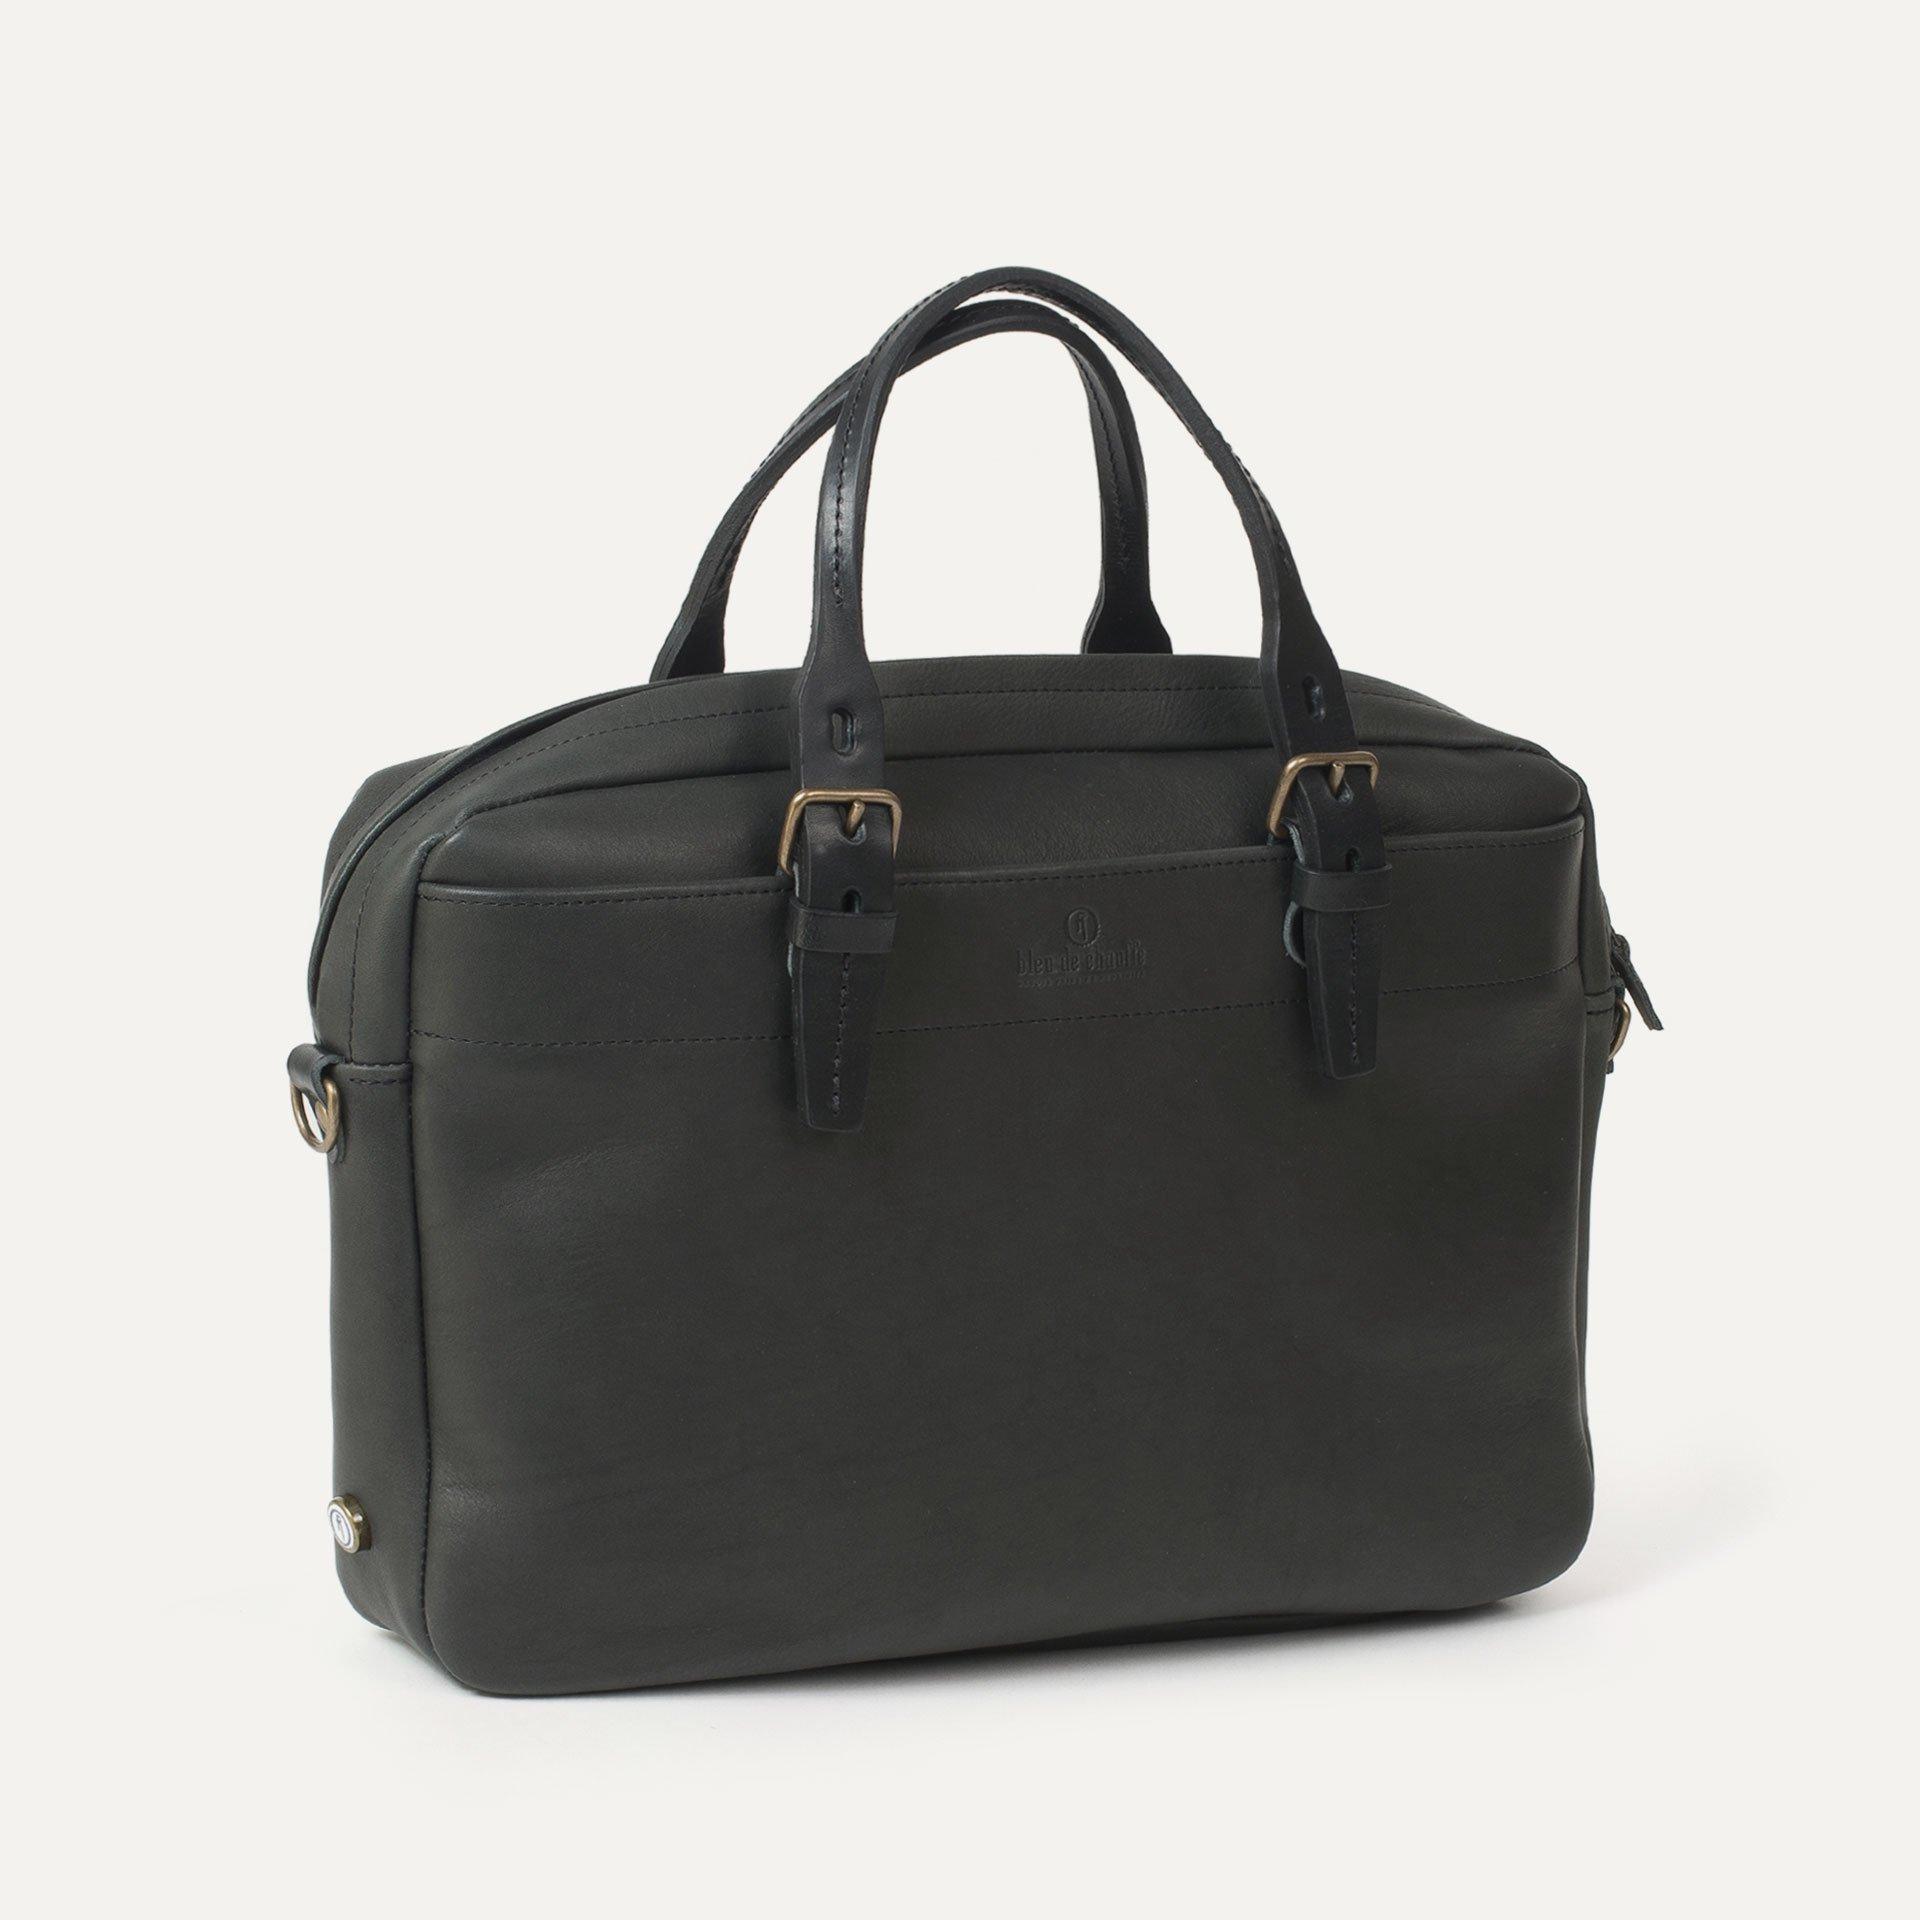 Sac business Folder - Noir (image n°2)